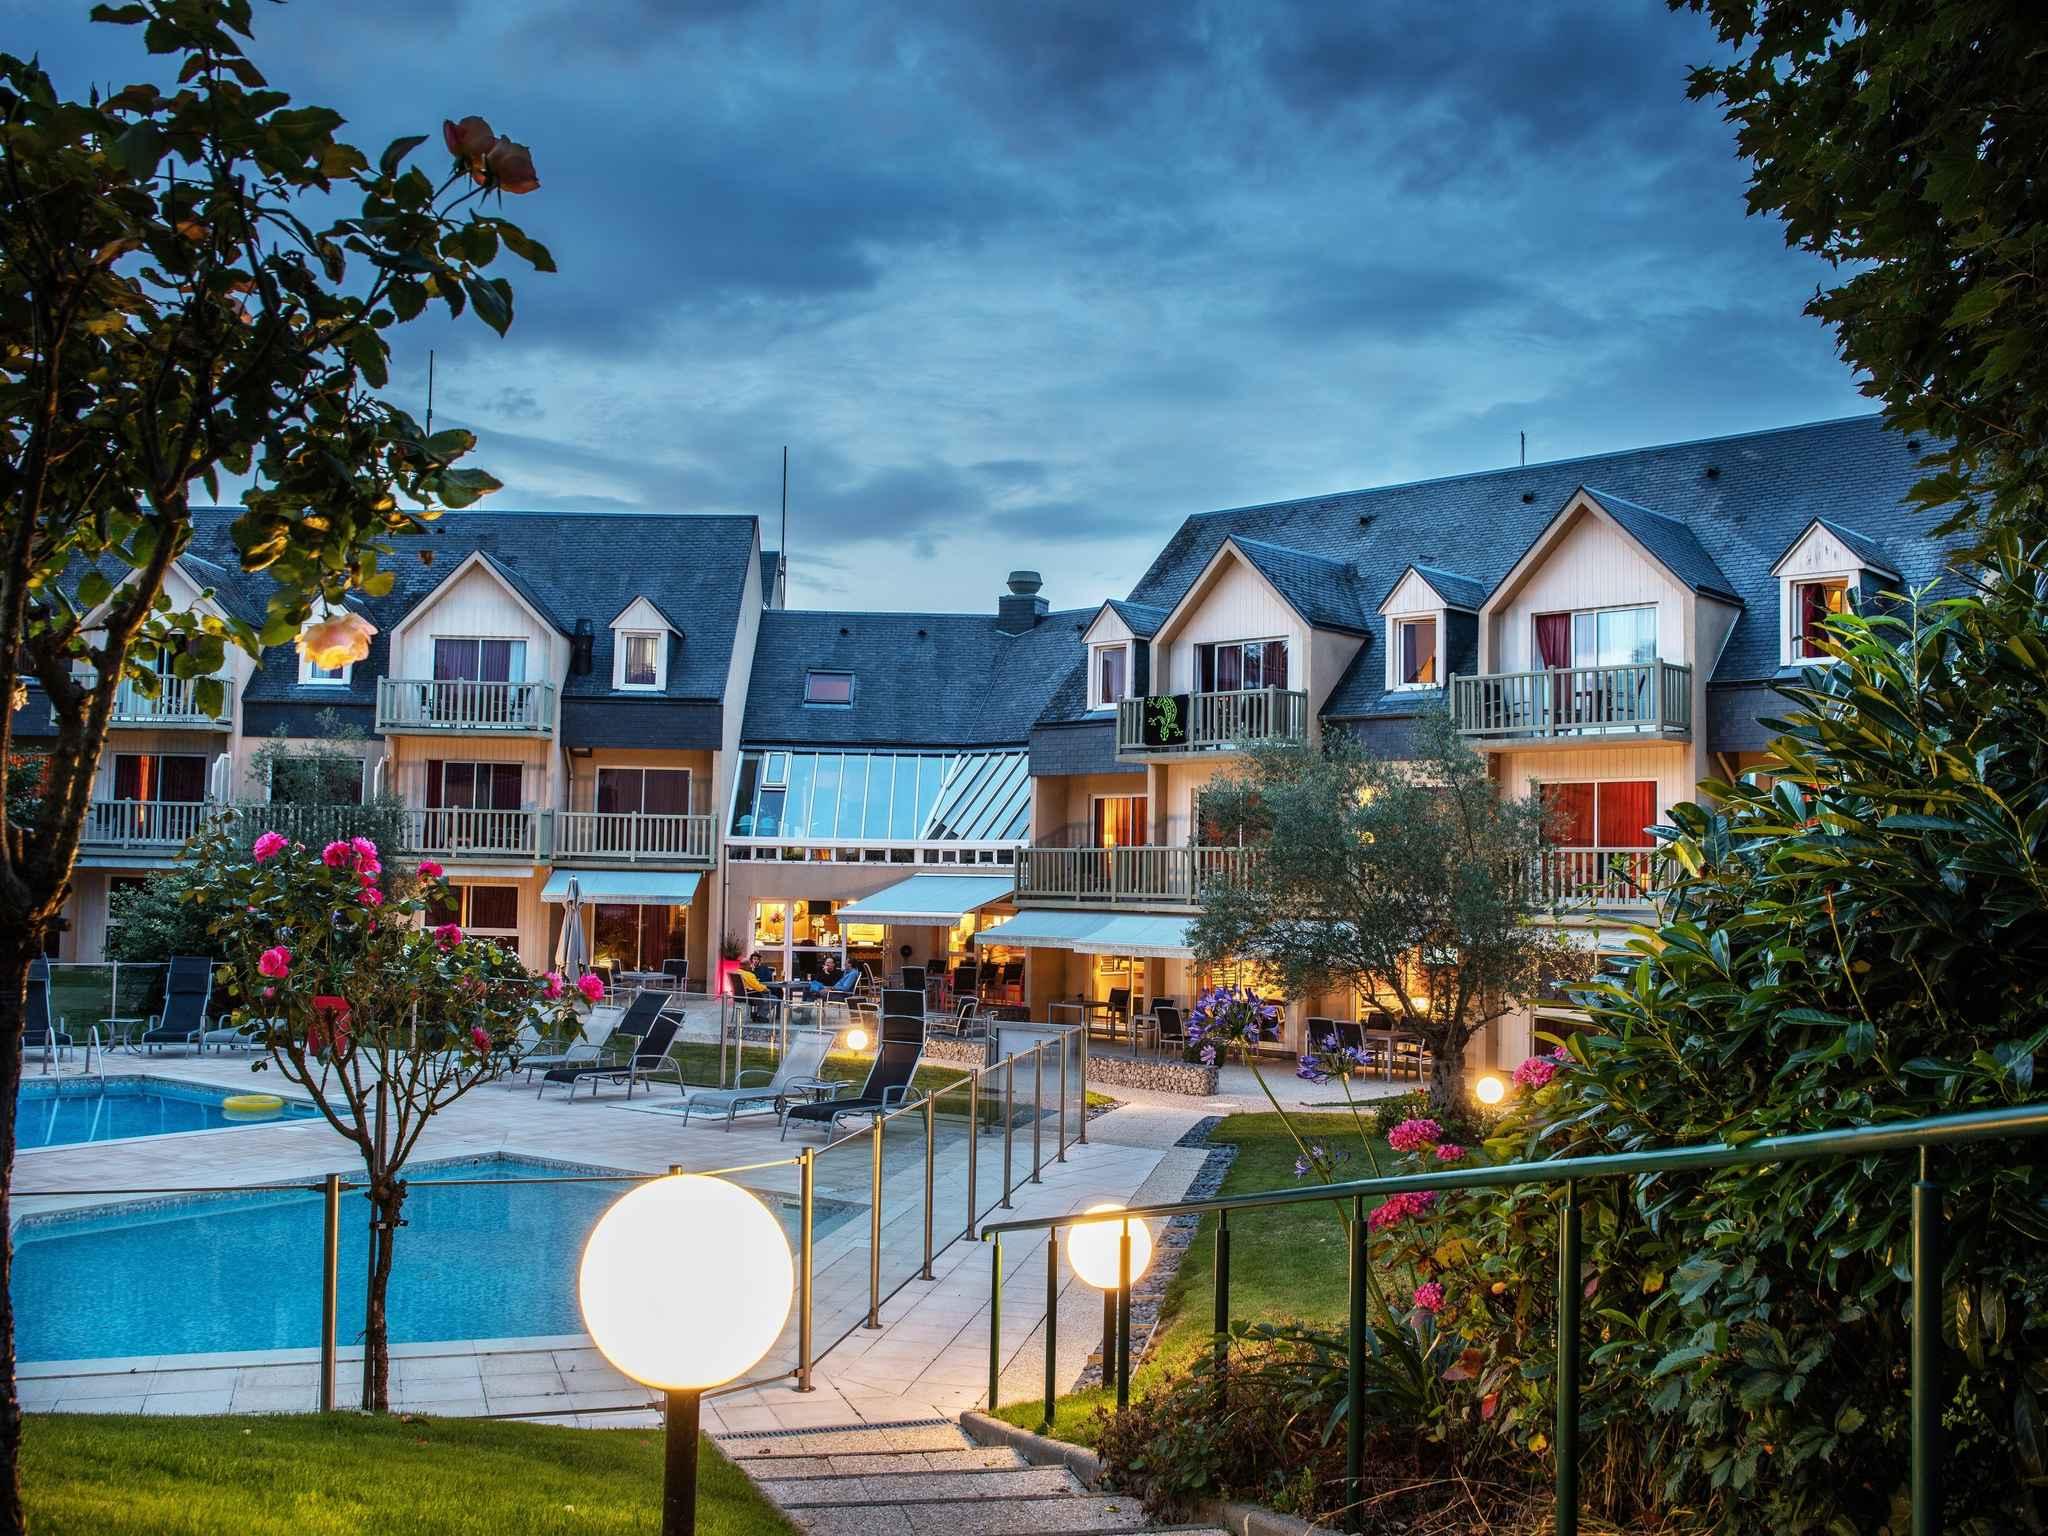 Hotel – Hotel Mercure Omaha Beach